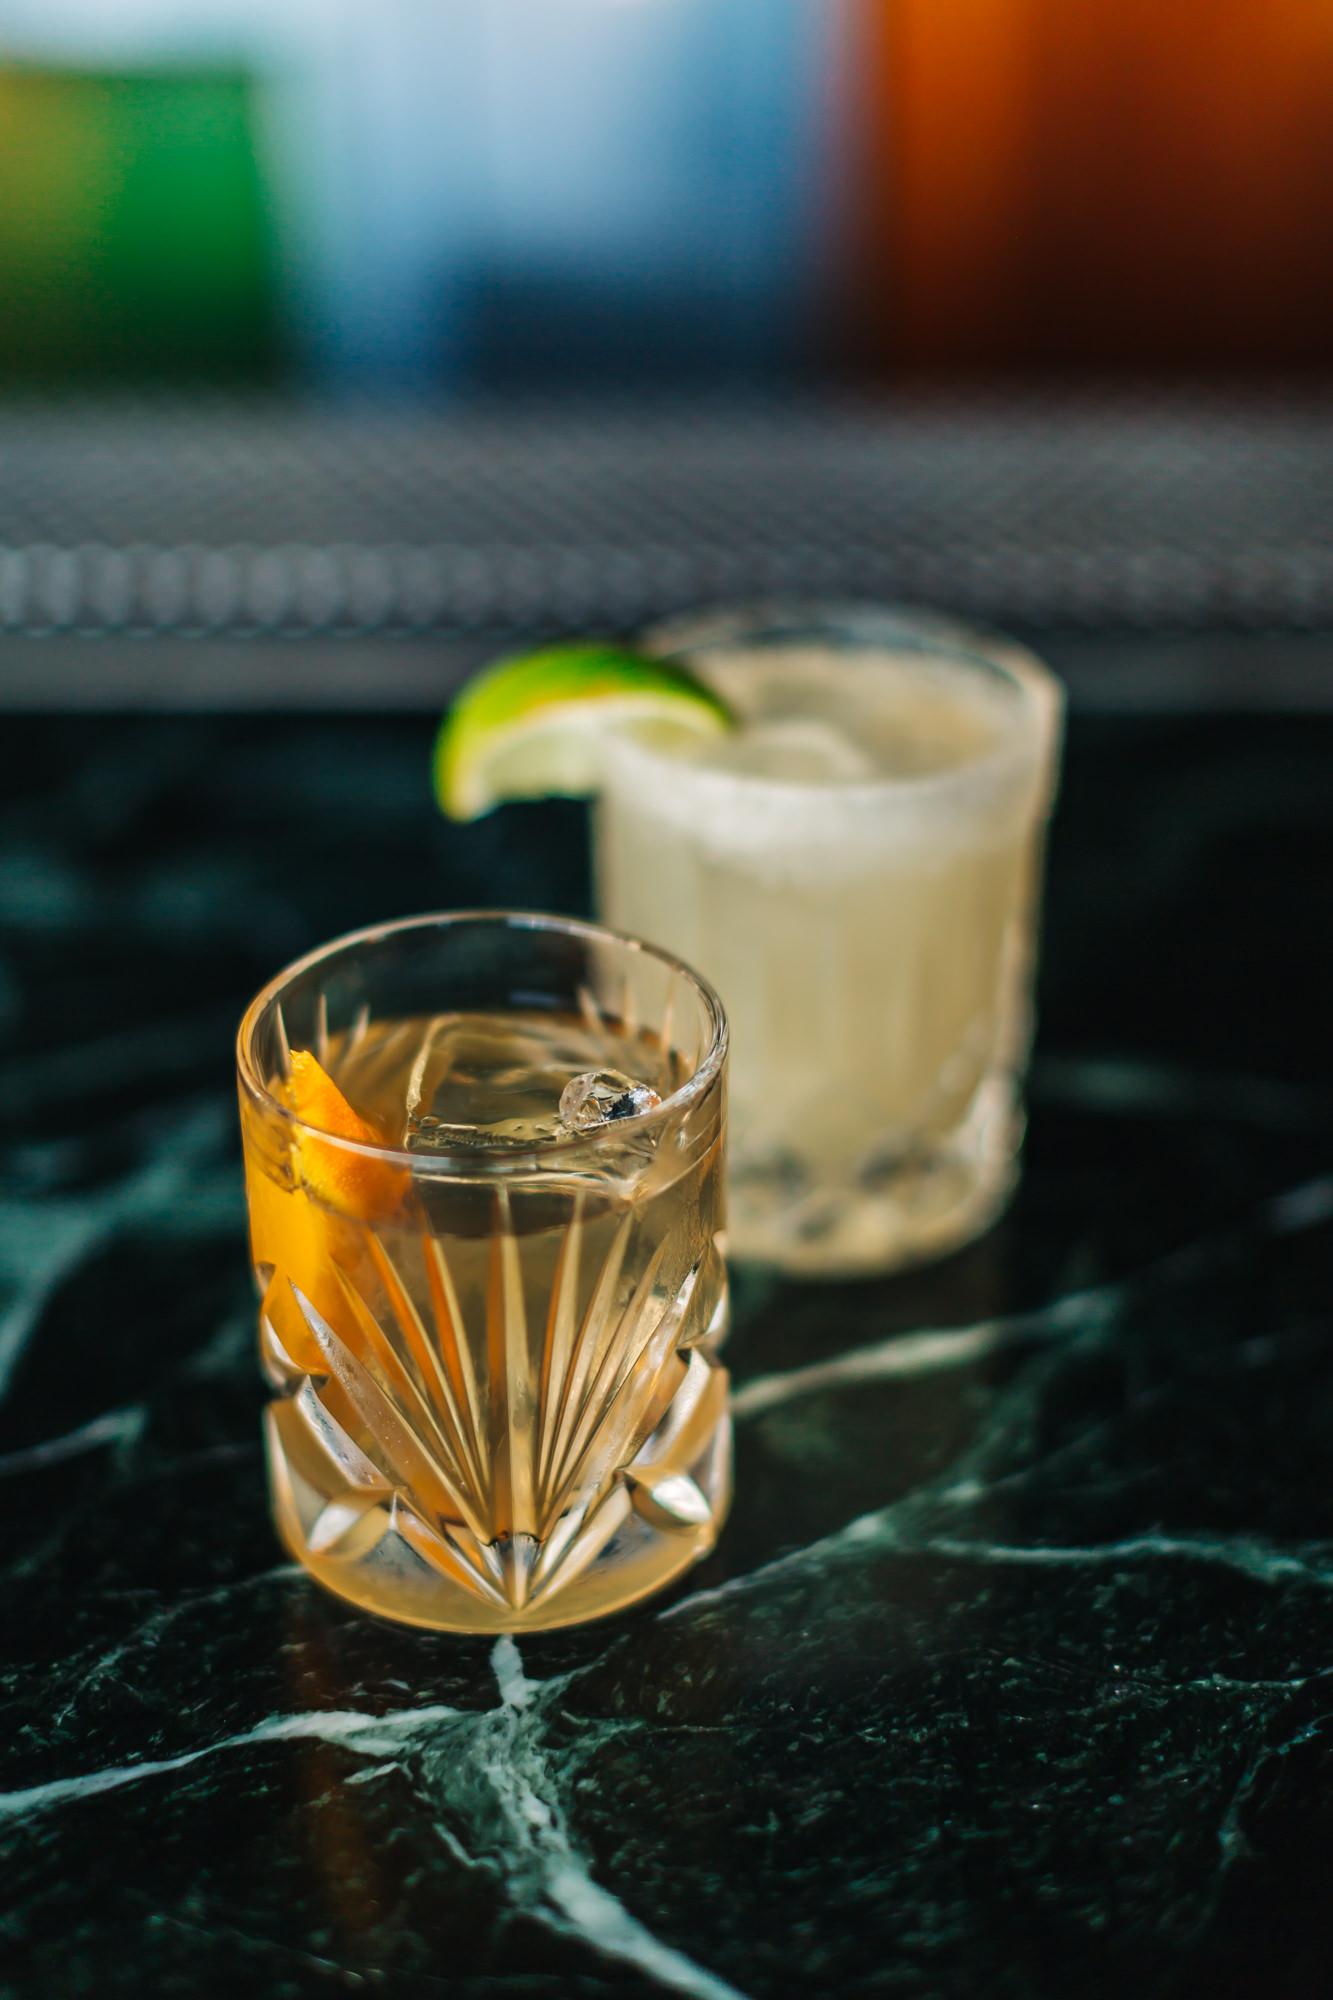 The Rusy Nail - Japanese Whisky, 15 YR Drambouie, Lemon Twist